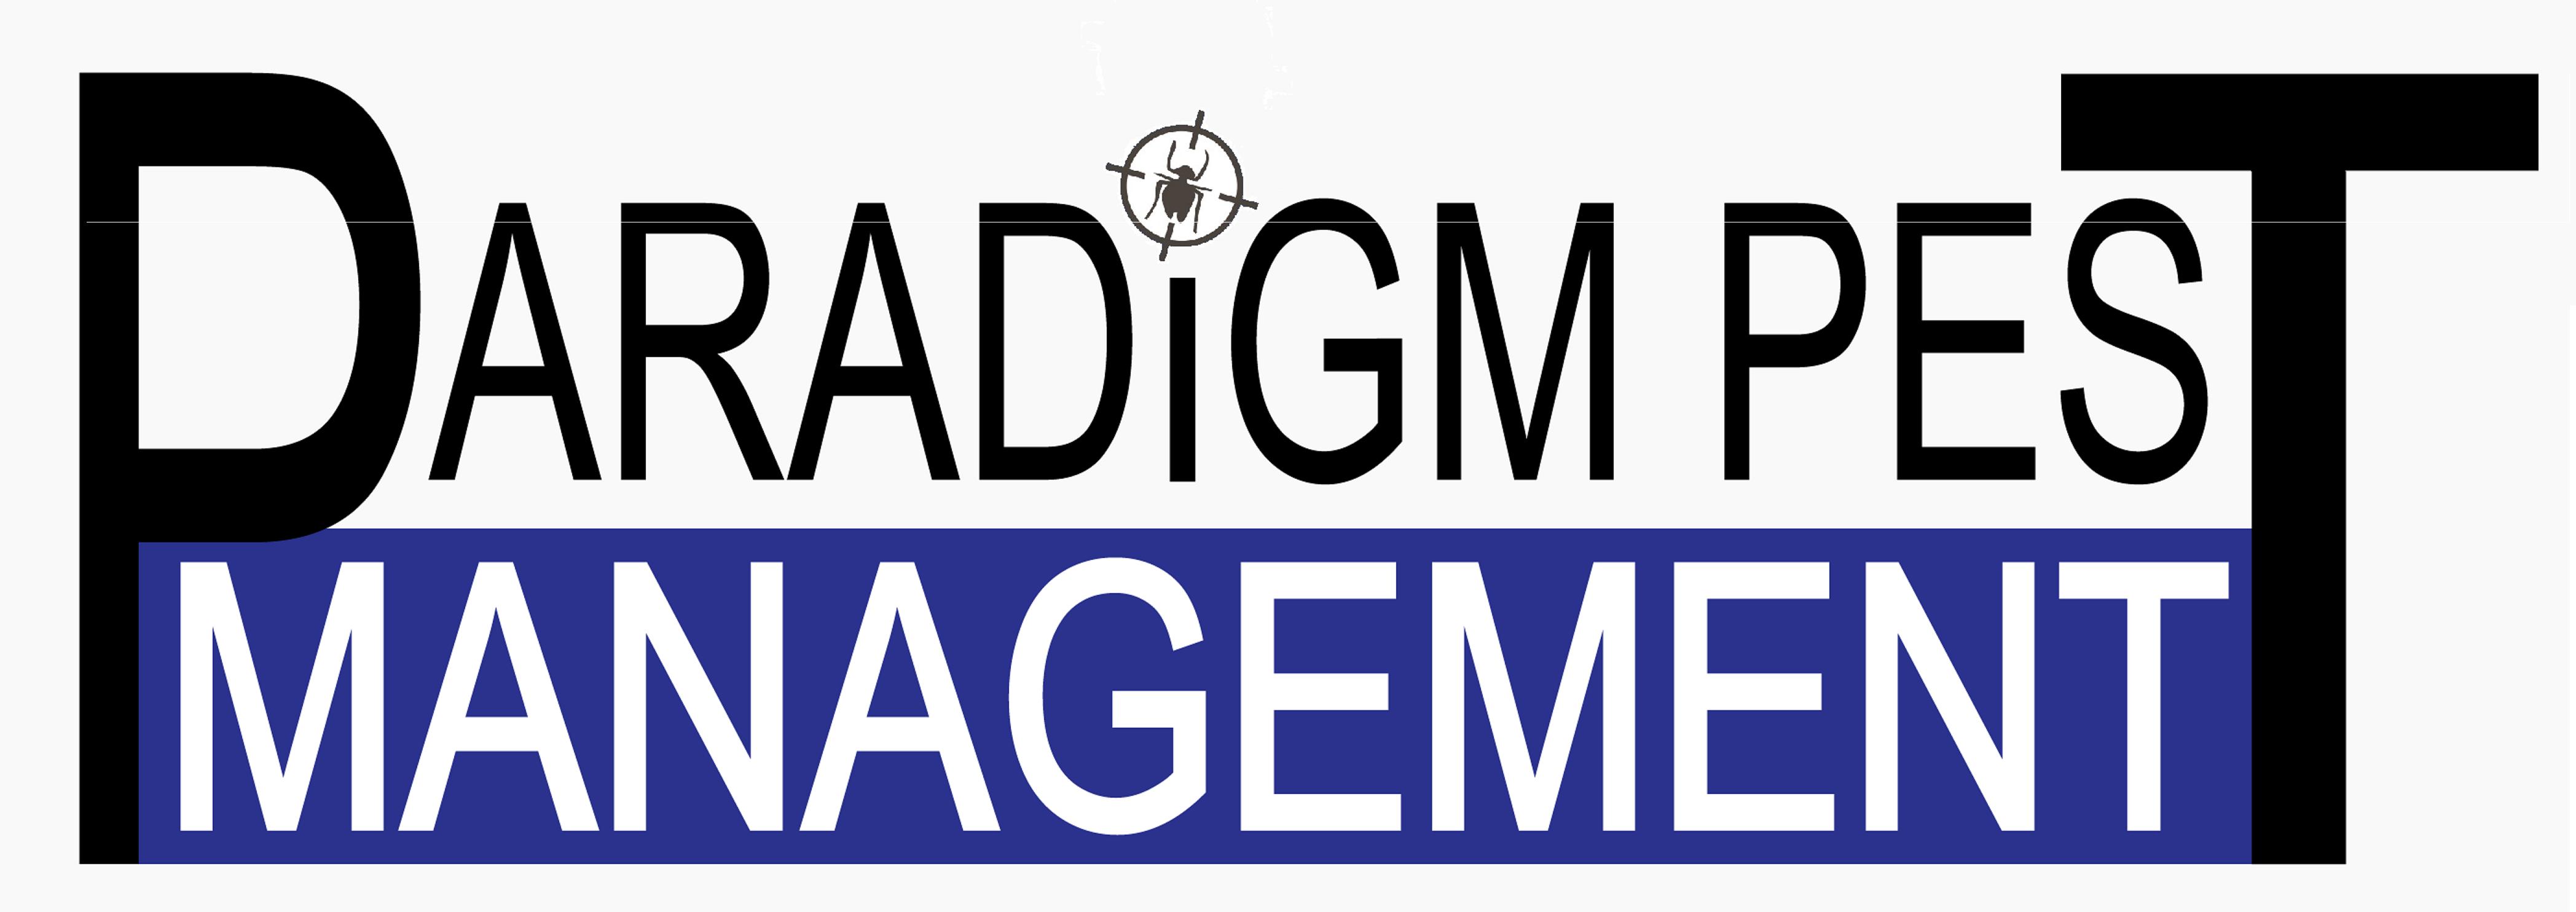 Paradigm Pest Management Logo Enlarged